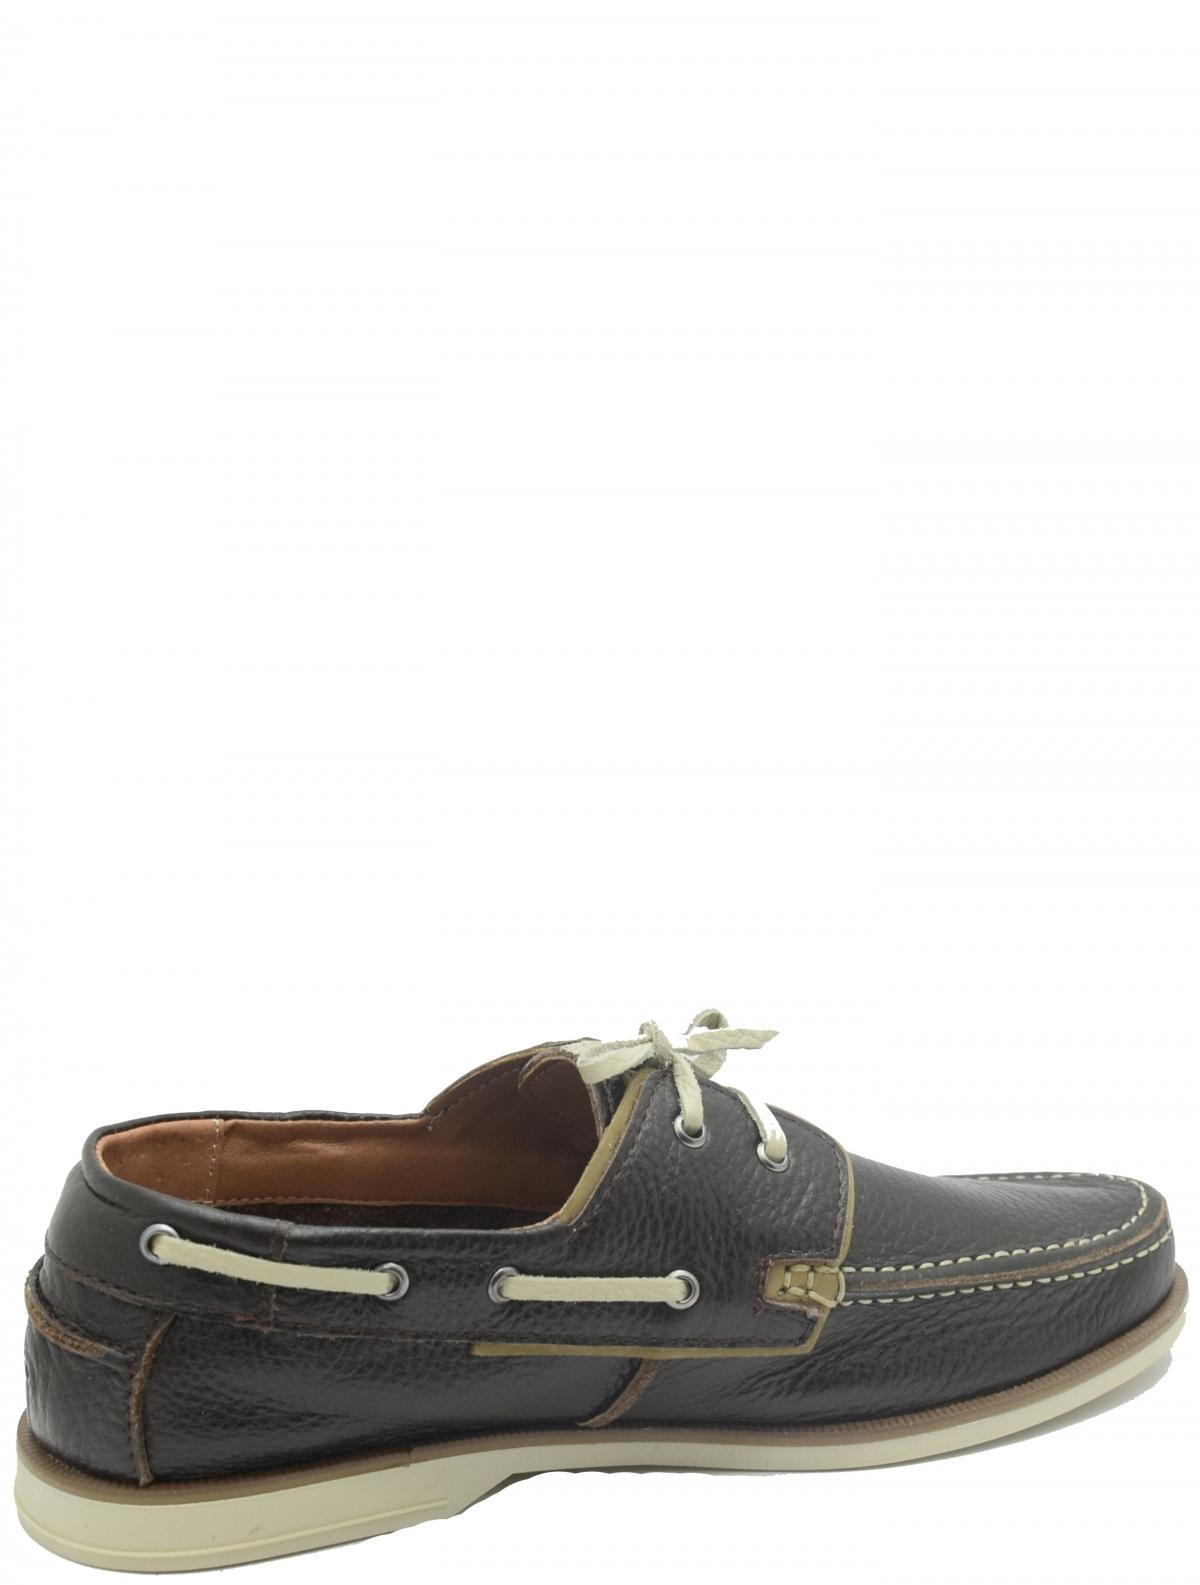 Rooman 300-111-S2C мужские туфли